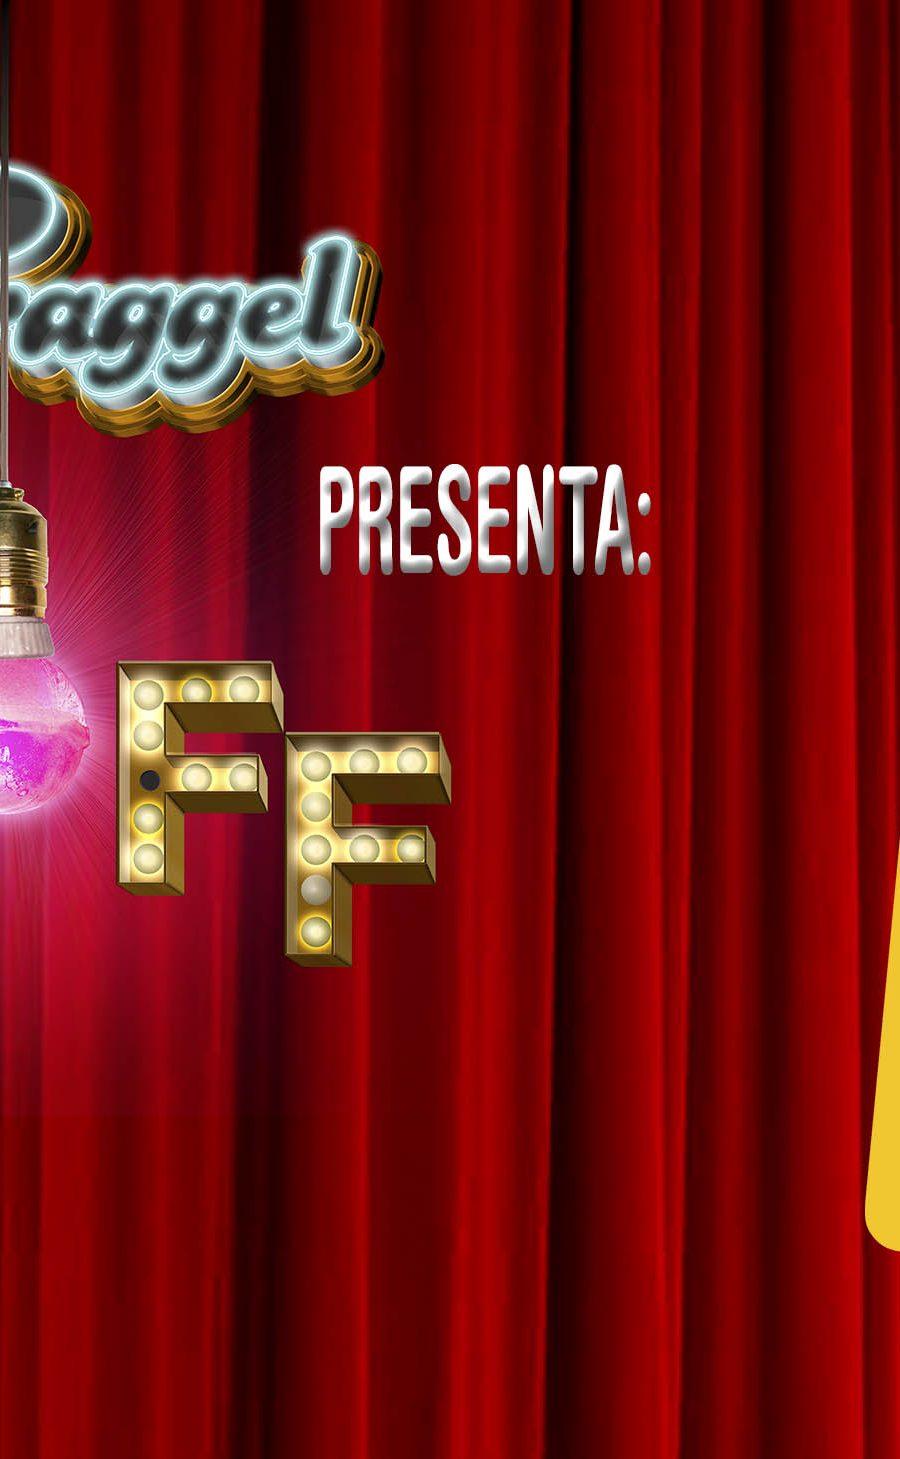 Banner Impro Fraggel julio 2017